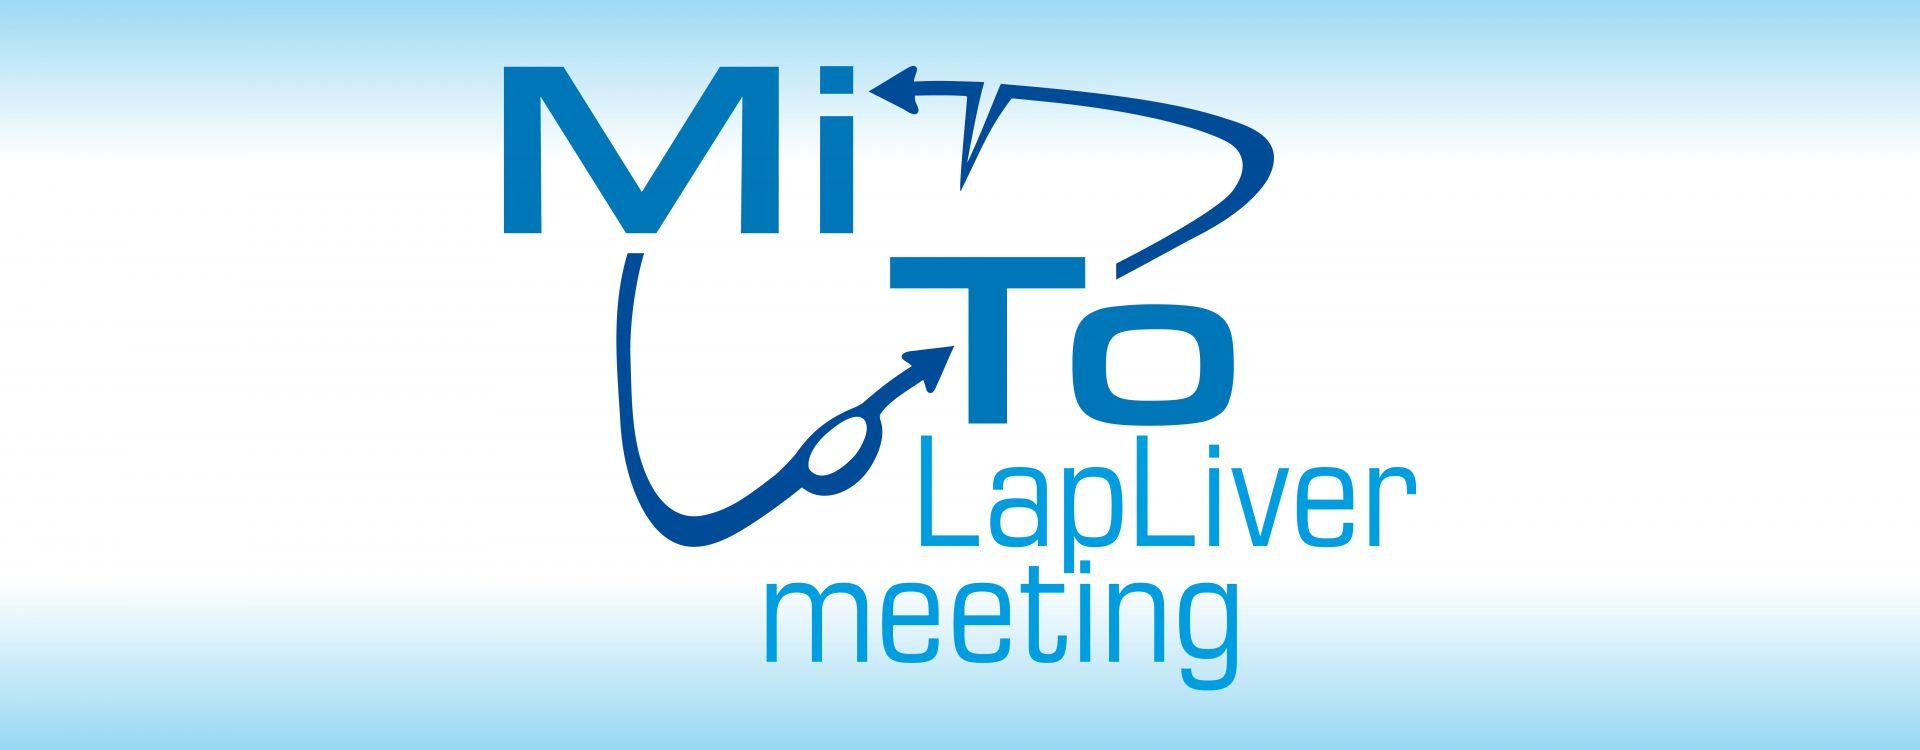 MITO LapLiver Meeting 1